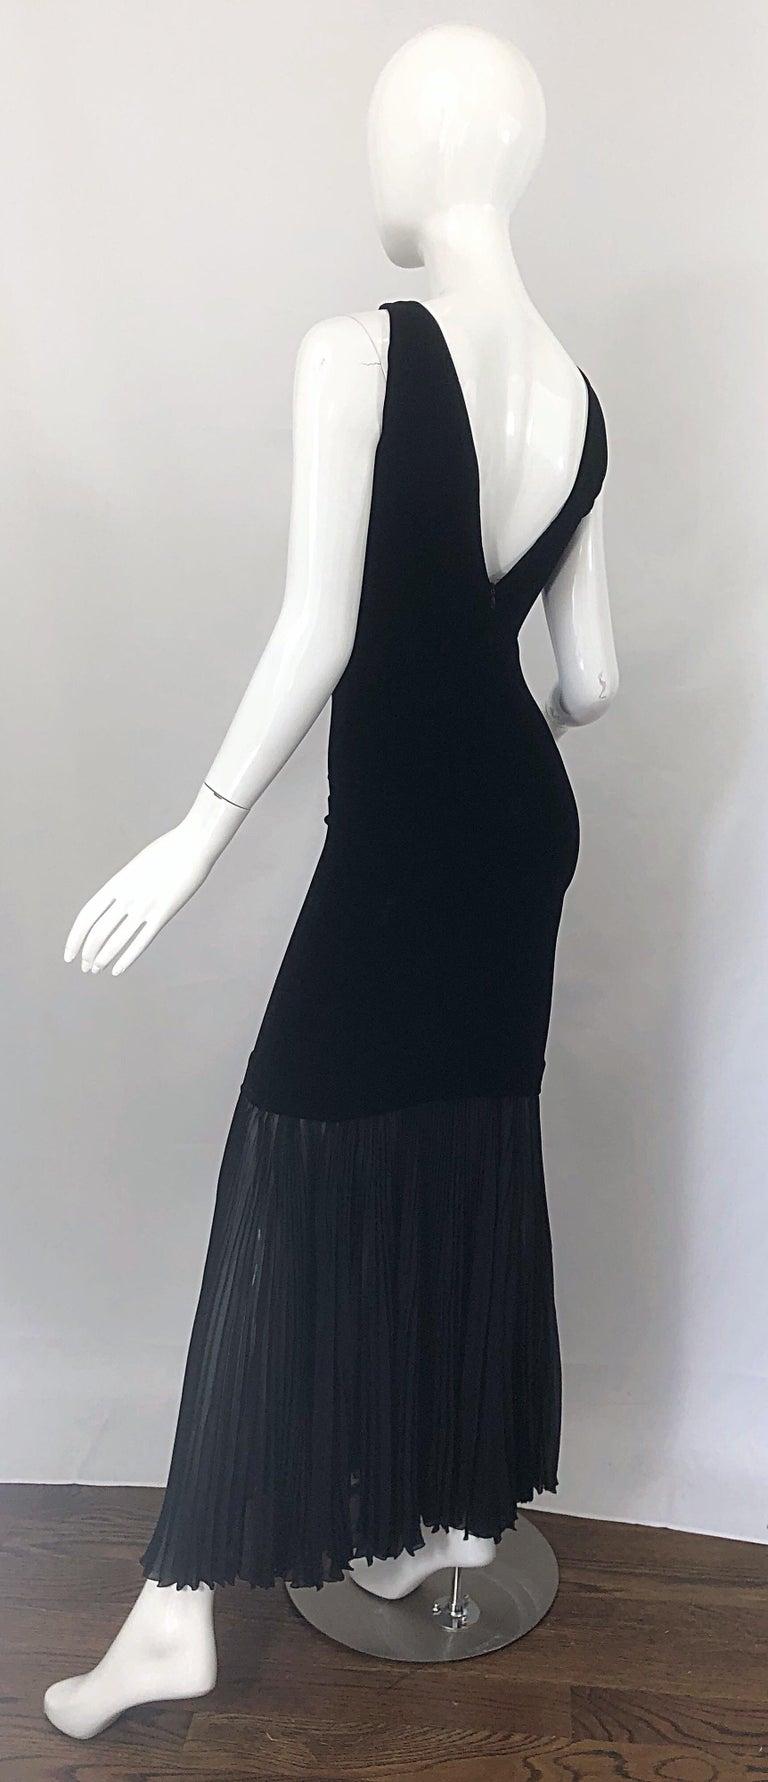 1990s Jean Paul Gaultier Avant Garde Black Velvet Vintage 90s Mermaid Gown Dress For Sale 11